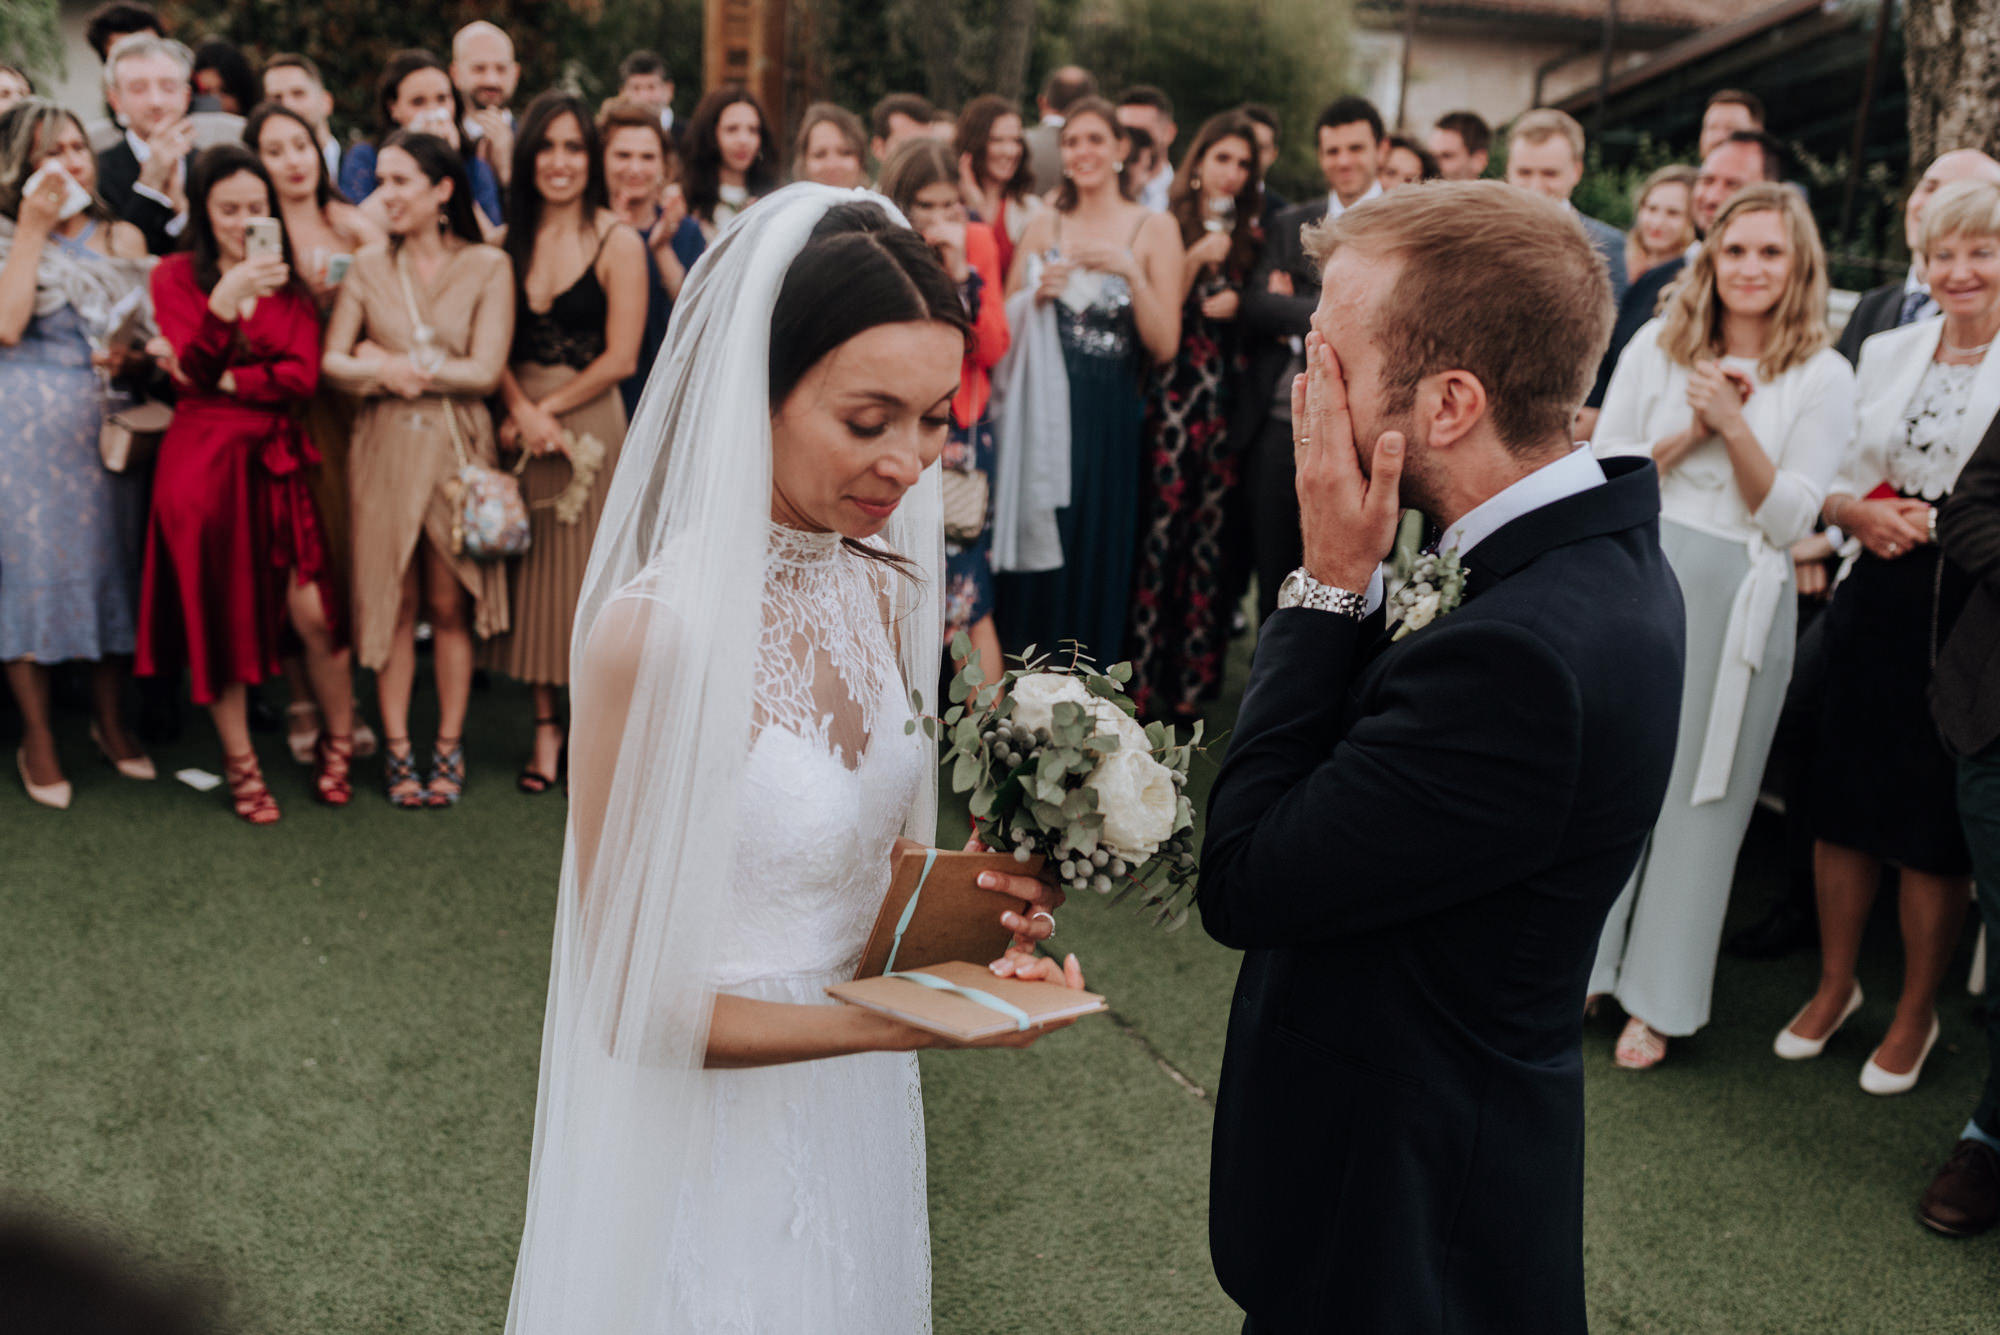 FOTO+PHOTO+BODA+WEDDING+ITALIA+ITALY+MAURICIO+GARAY+MAURICIOGARAY+WEDDINPHOTOGRAPHER+FOTOGRAFODEBODA-1500.jpg